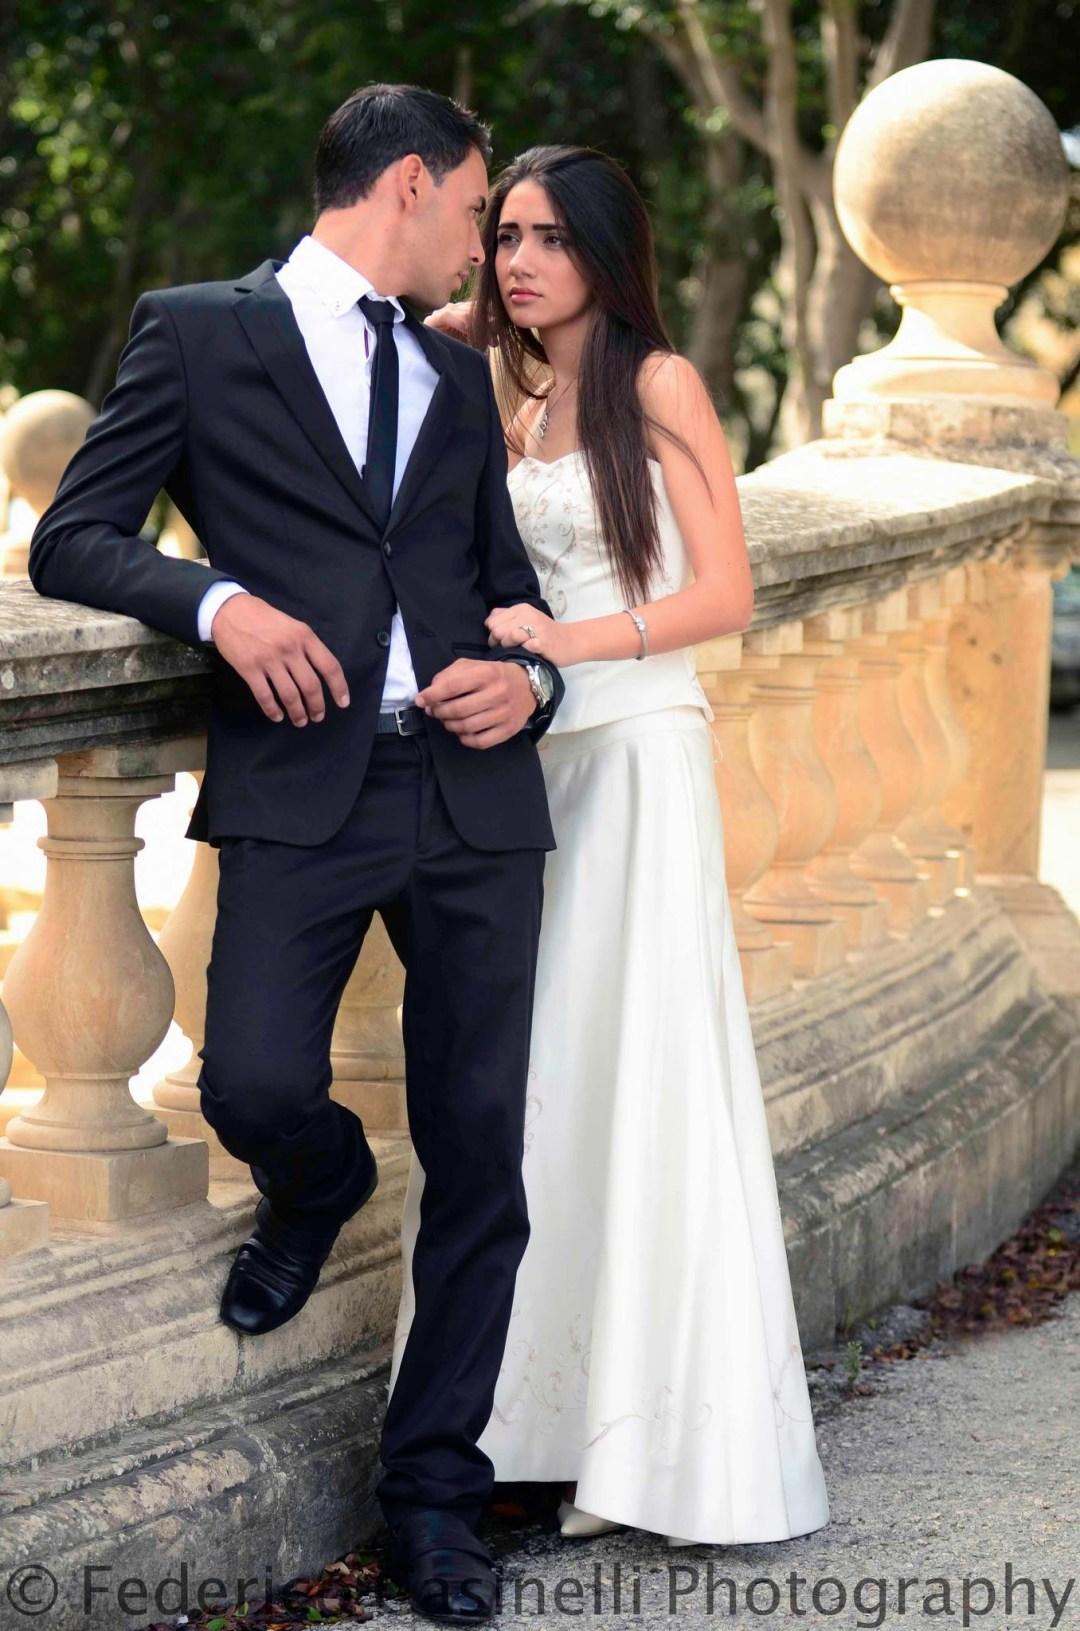 victoria bridal gown